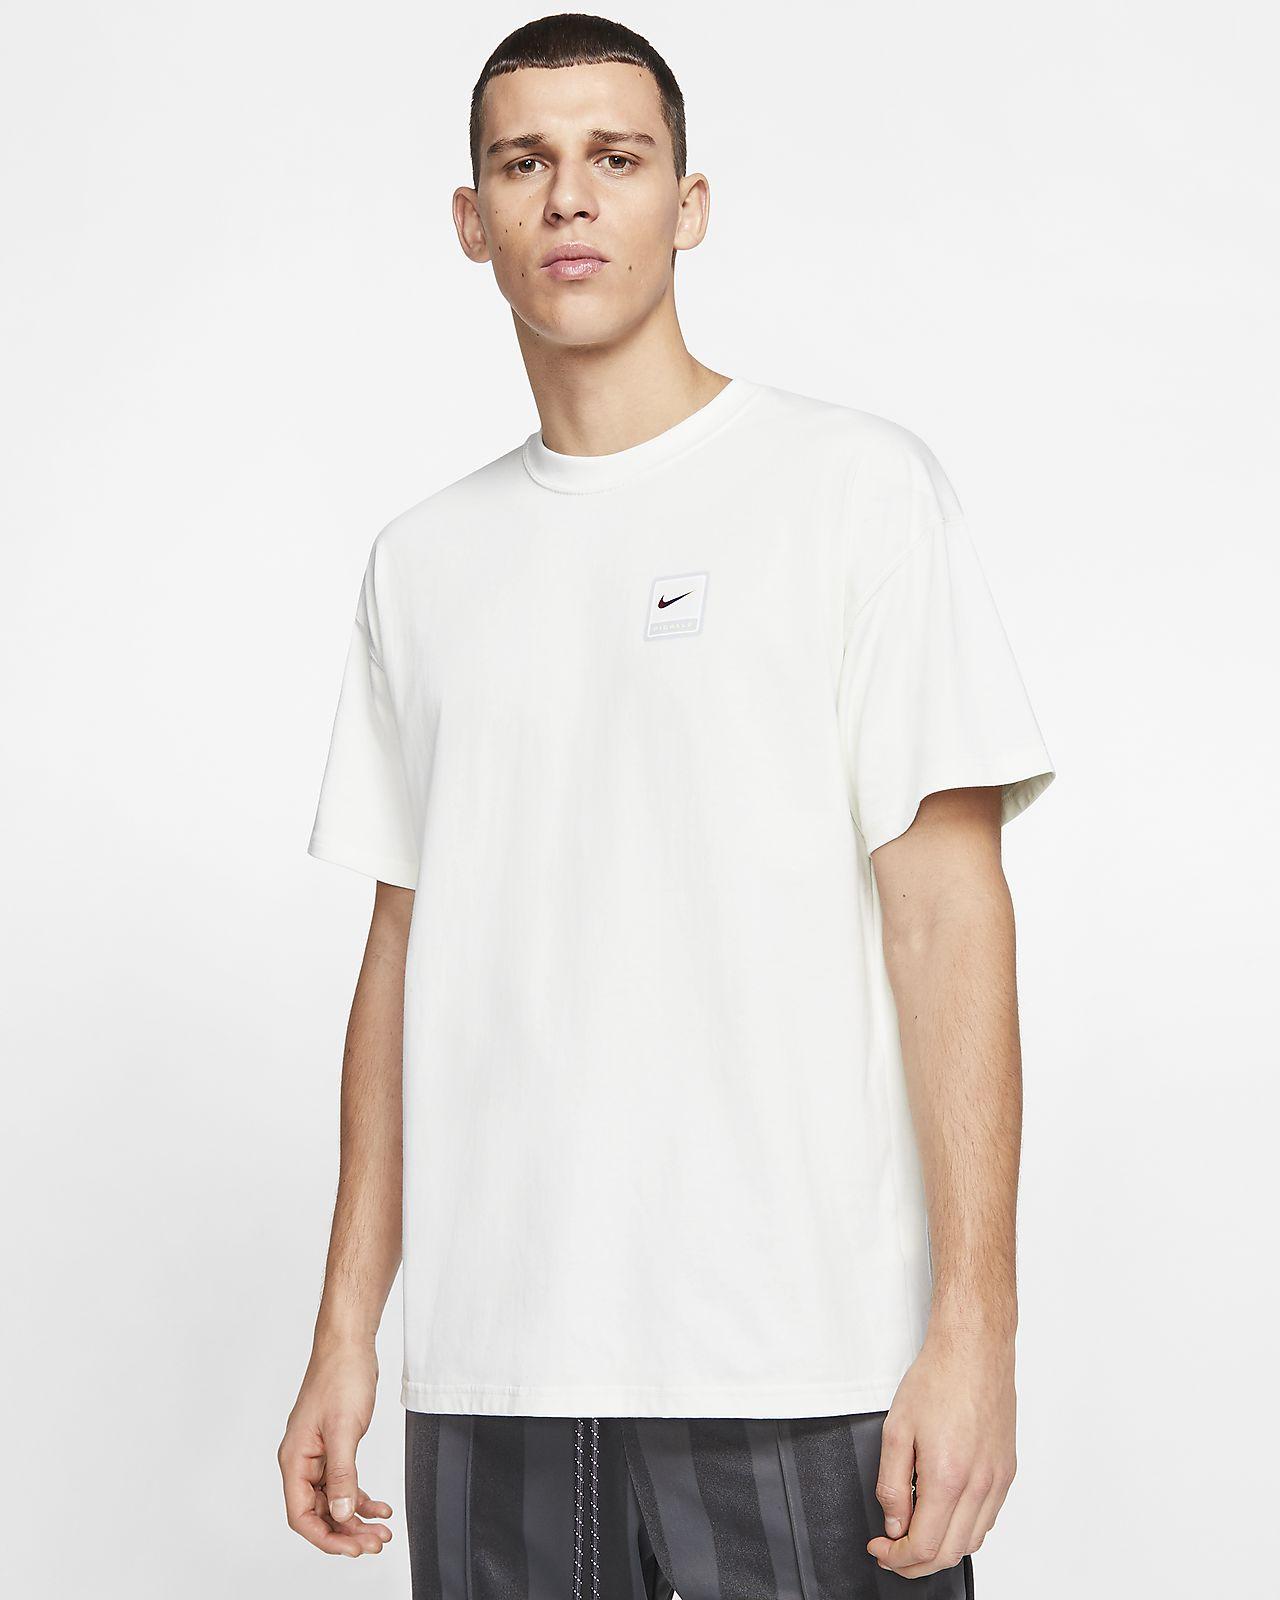 Nike x Pigalle 男子T恤